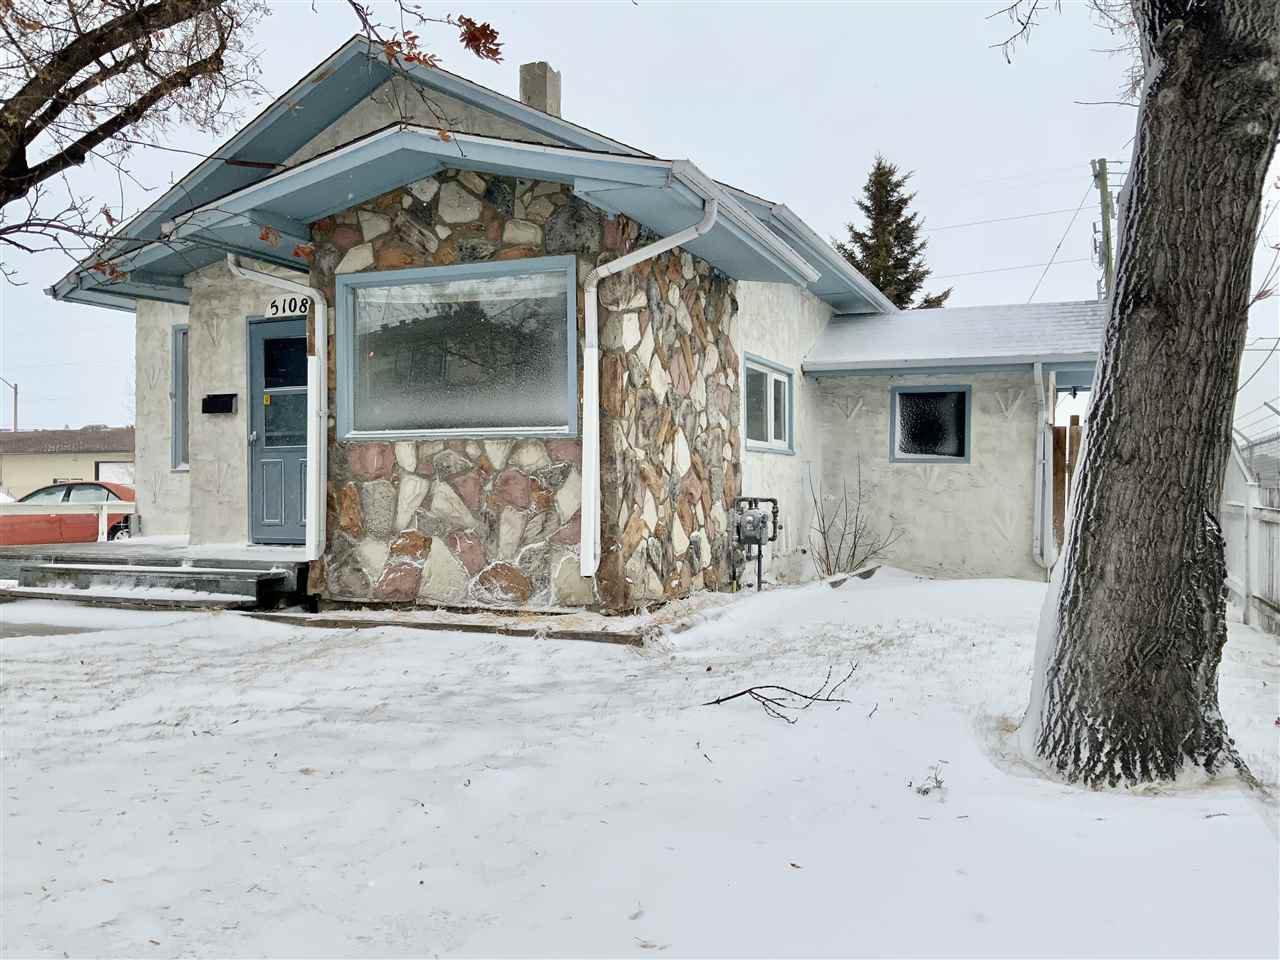 Main Photo: 5108 53 Avenue: Wetaskiwin House for sale : MLS®# E4225078